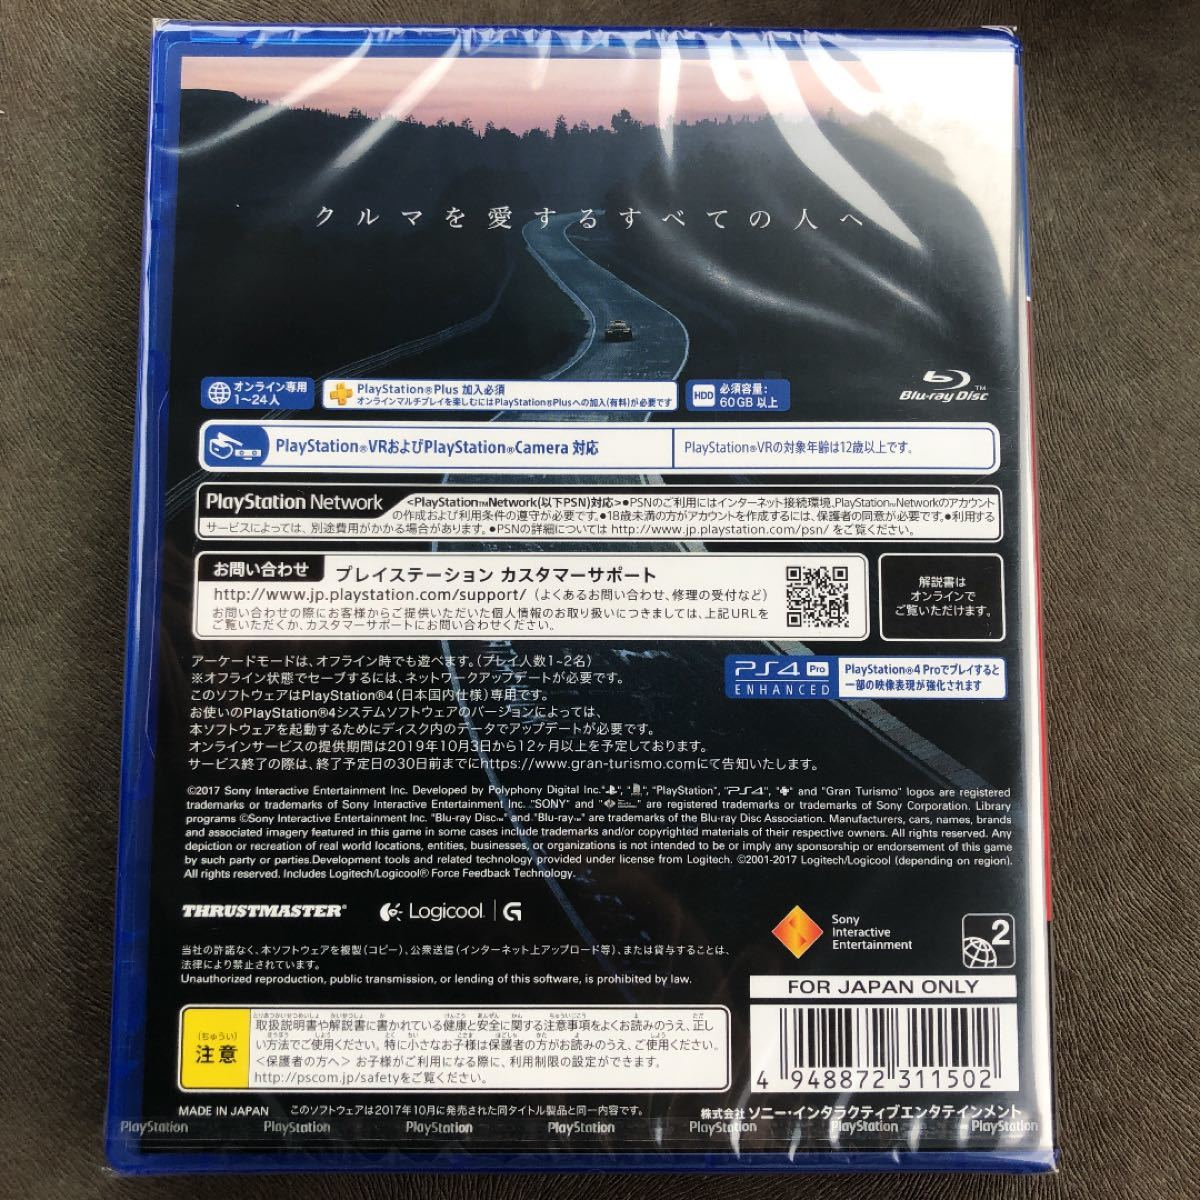 【PS4】 グランツーリスモSPORT [PlayStation Hits] 新品未開封 PS4